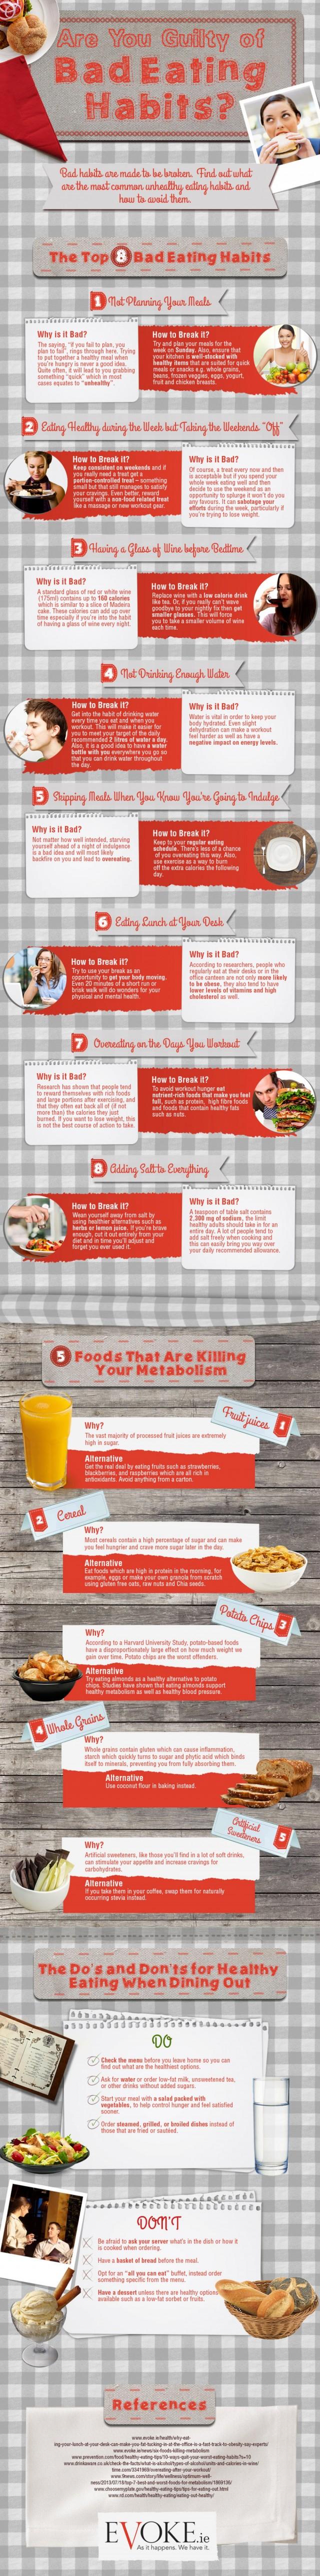 Habits That Make You Unhealthy